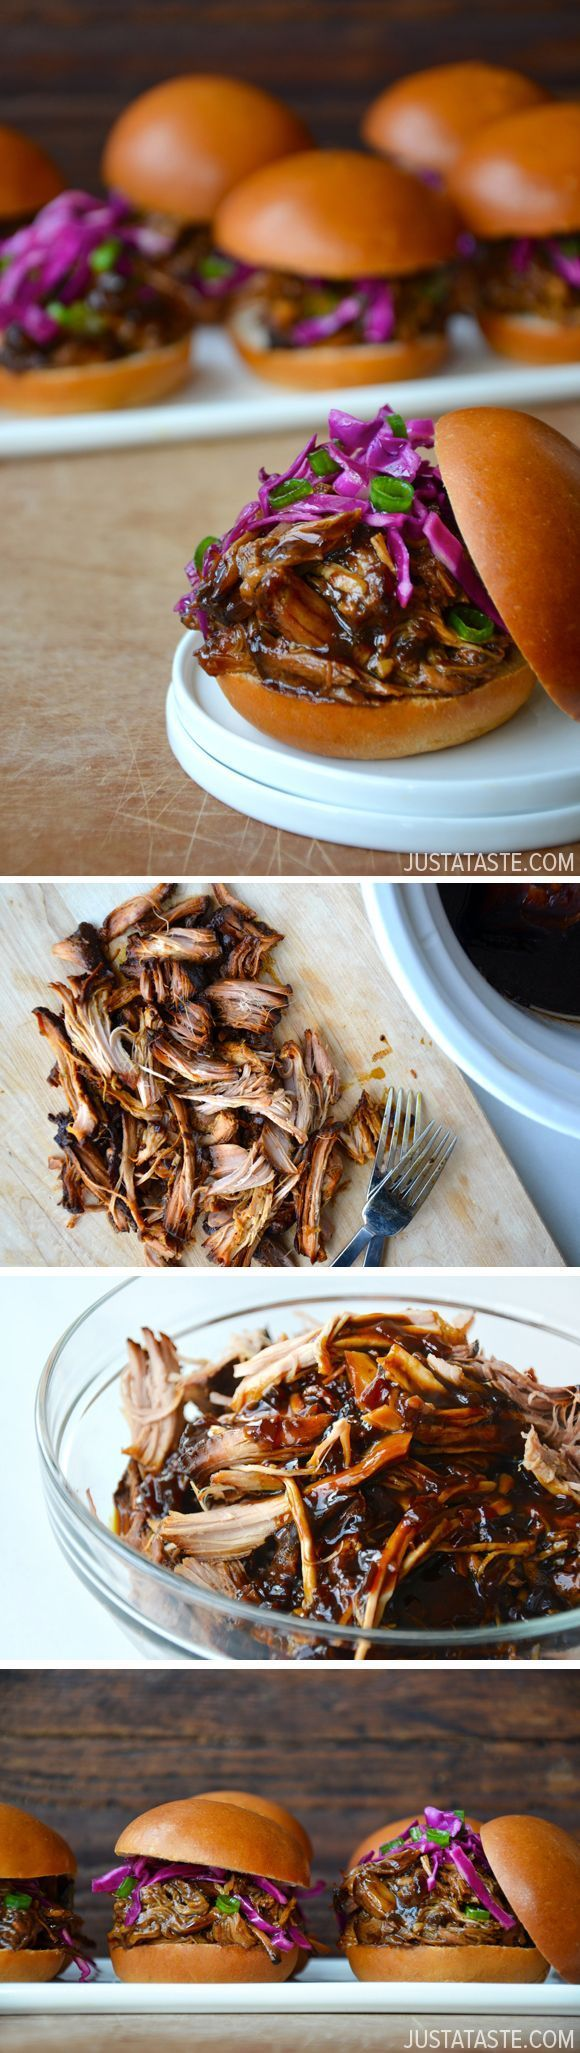 Slow Cooker Balsamic Honey Pulled Pork (scheduled via http://www.tailwindapp.com?utm_source=pinterest&utm_medium=twpin&utm_content=post55755964&utm_campaign=scheduler_attribution)